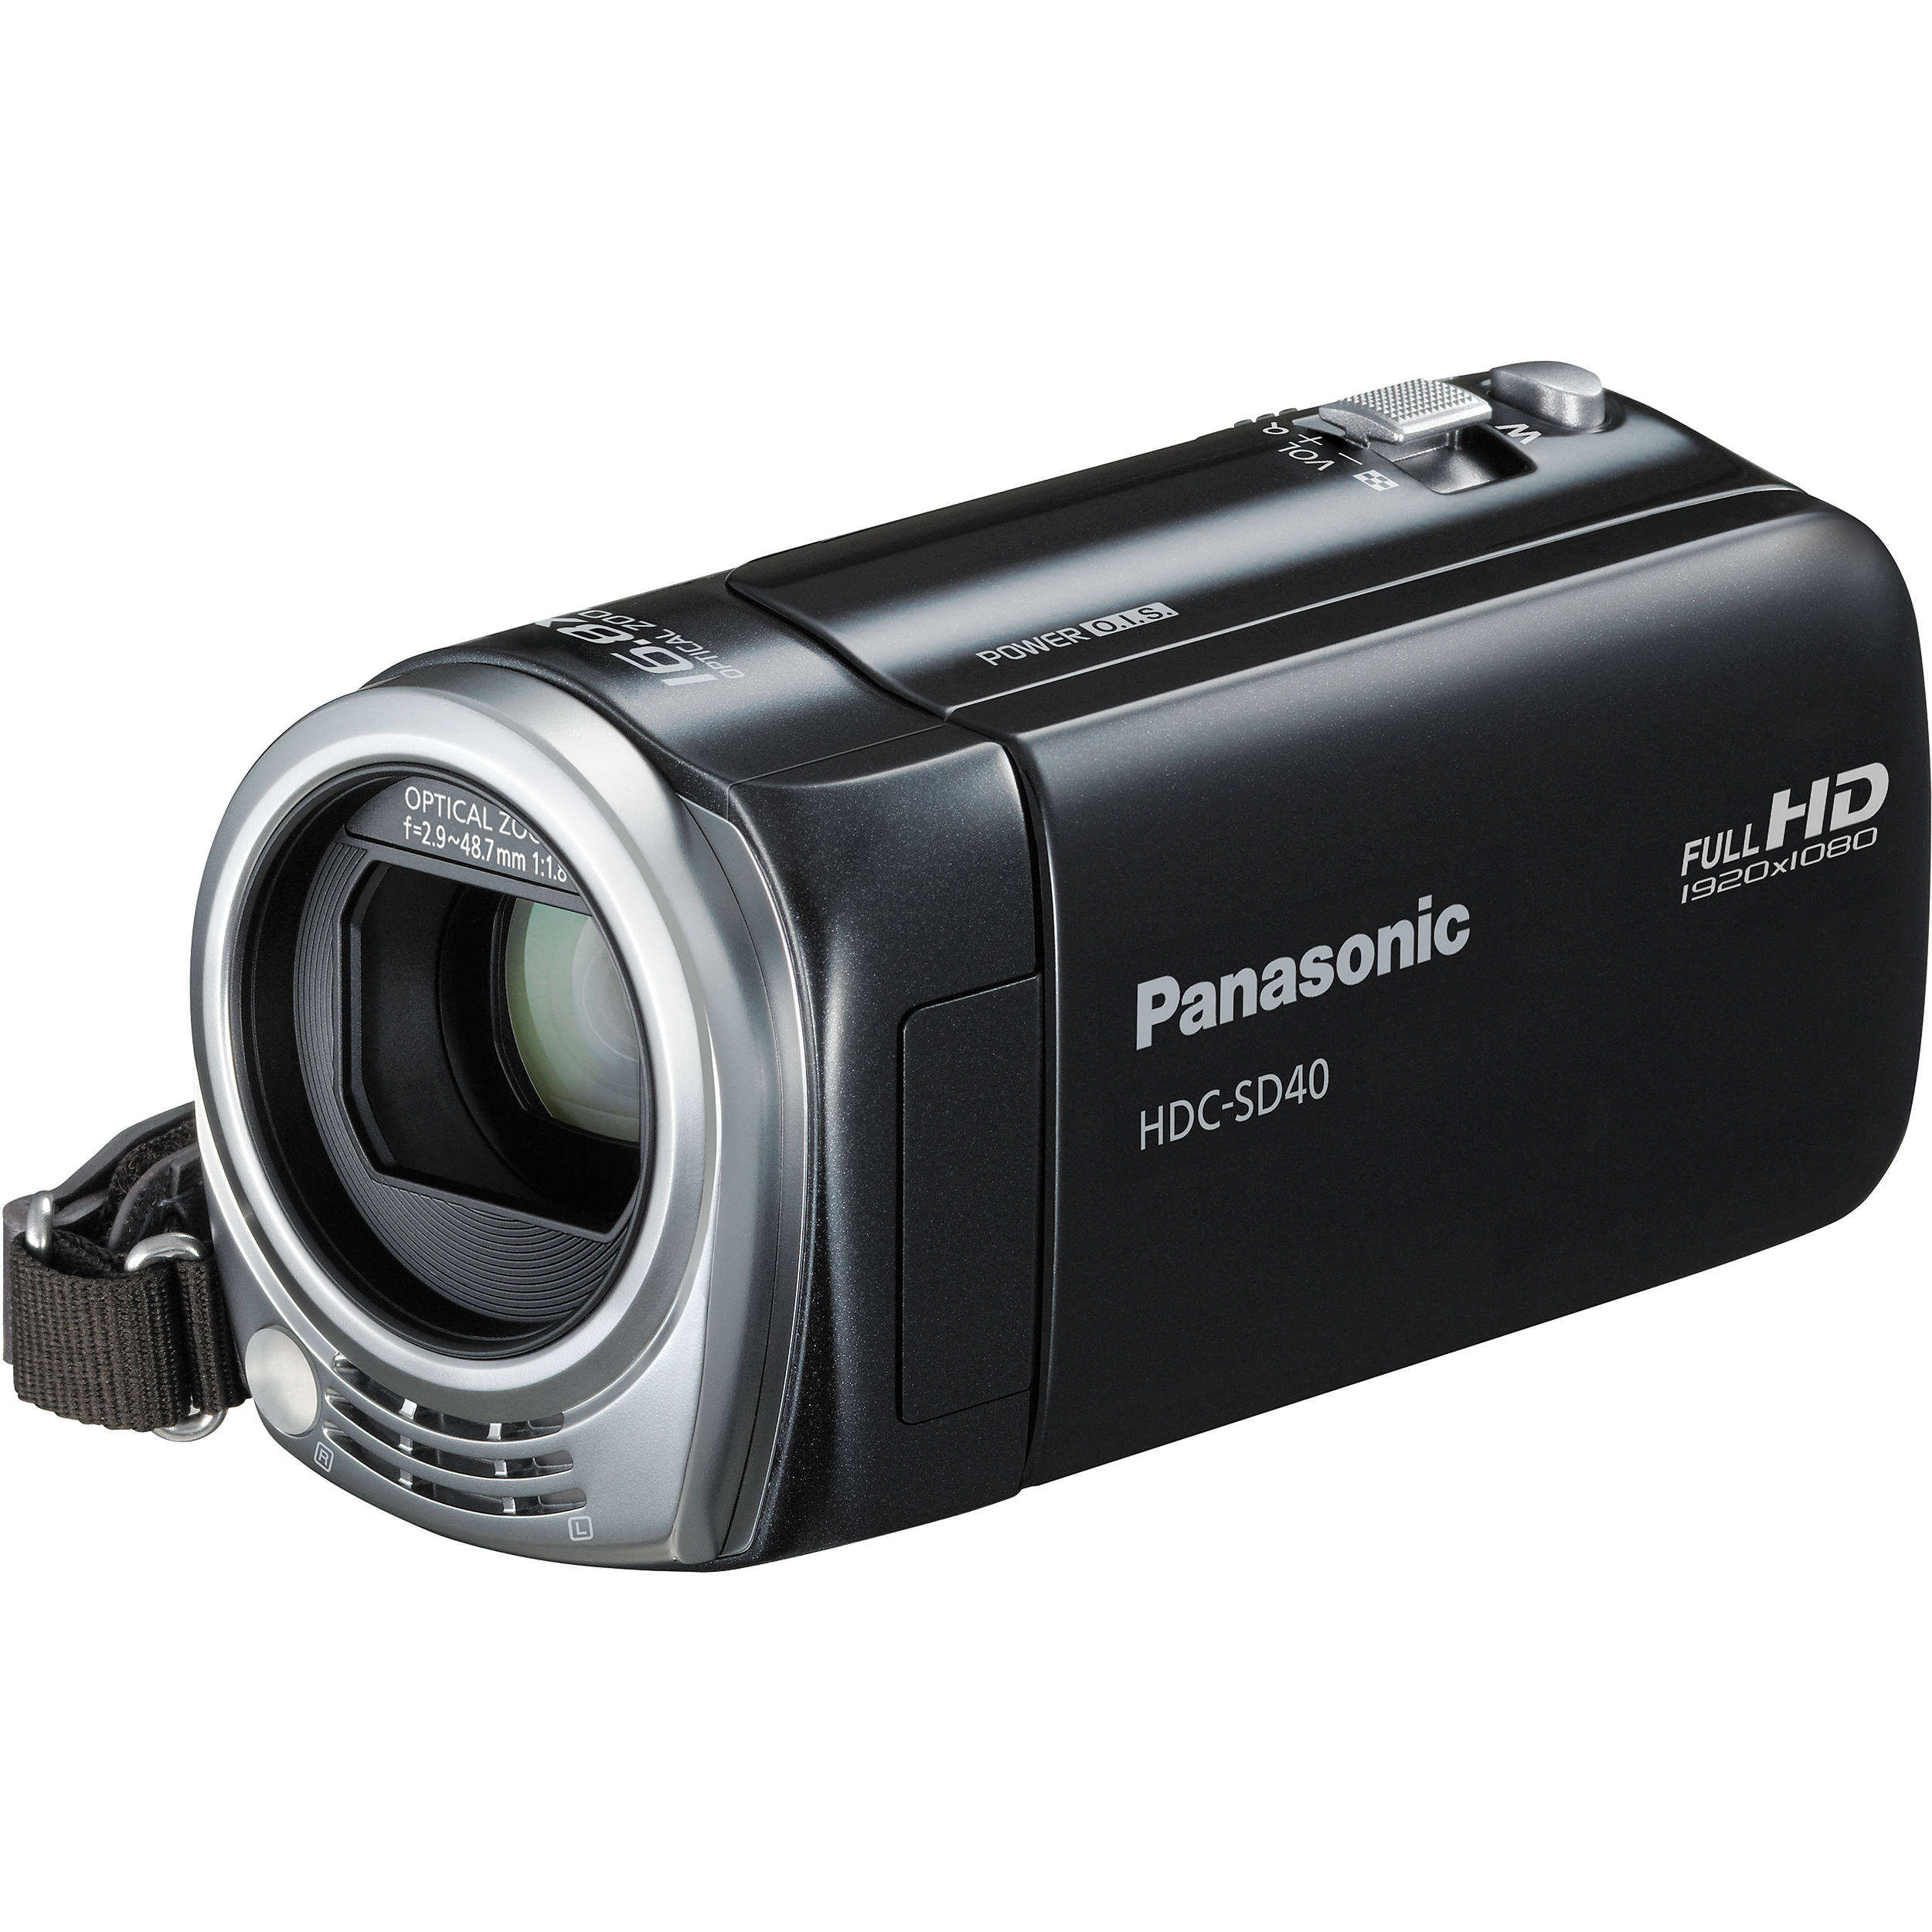 Panasonic HDC-SD40 High Definition Camcorder (Black) HDC-SD40K